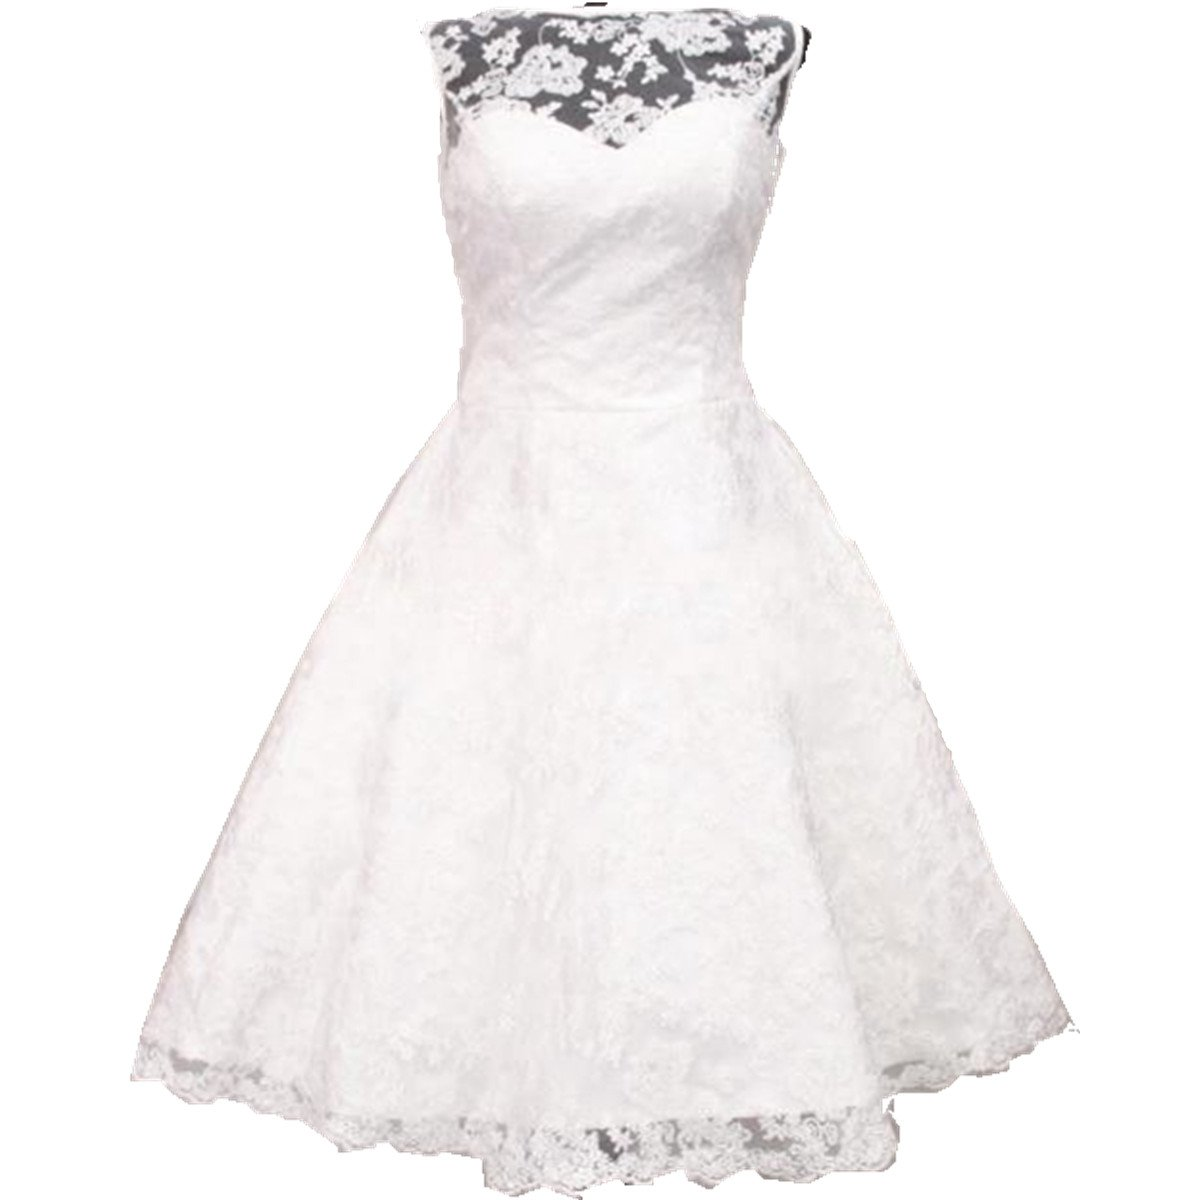 Zorabridal Women's Sheer A-line Tea Length Lace Short Wedding Gowns (18 Plus, White)